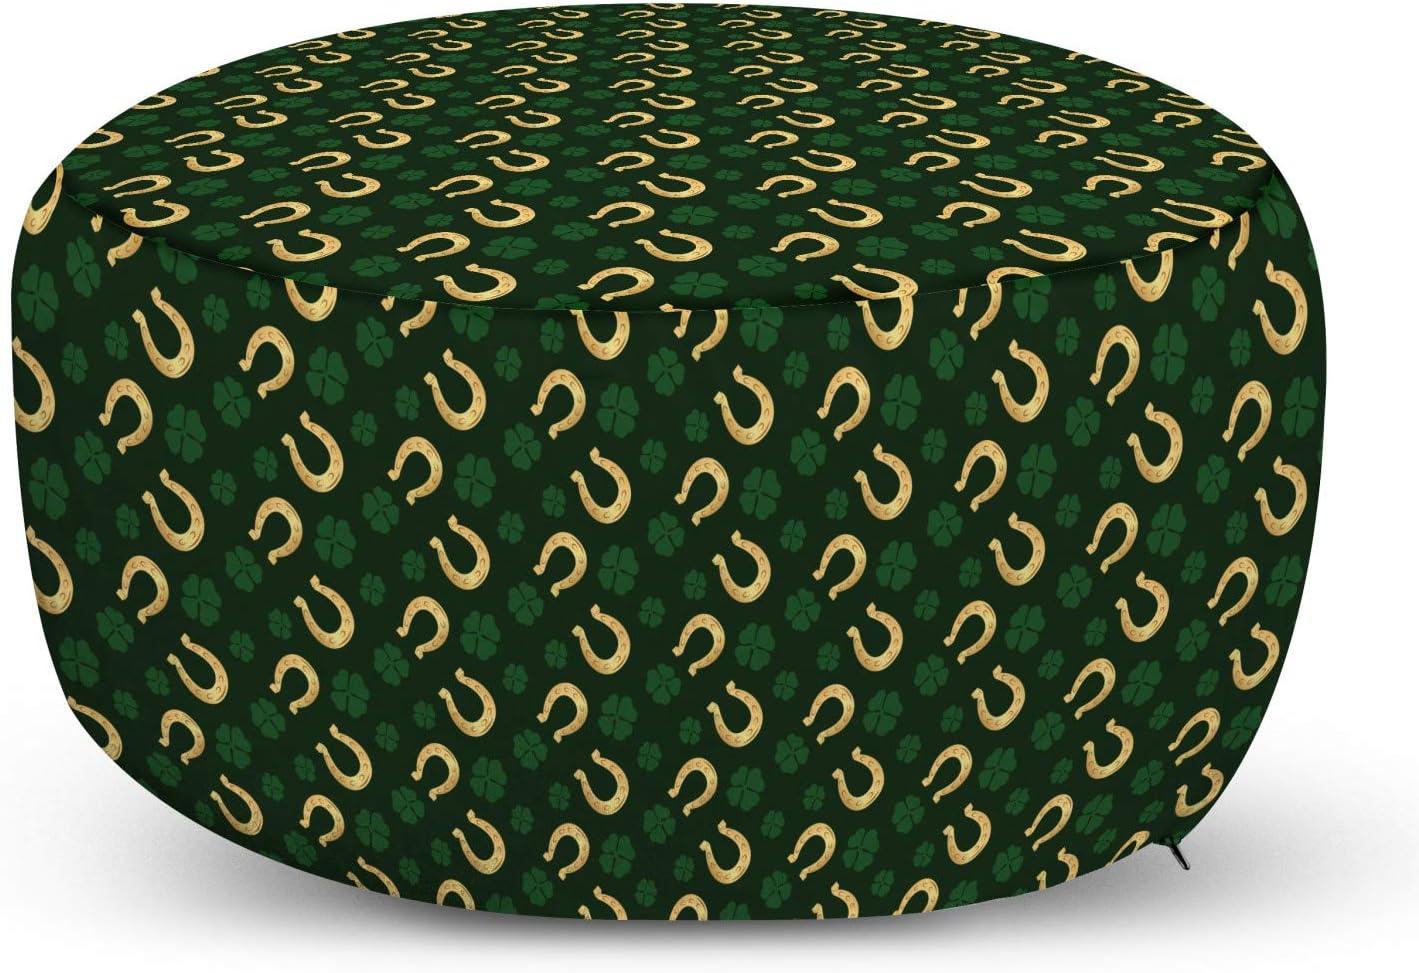 Lunarable Horseshoe Philadelphia Mall Pouf Cover with Them Large-scale sale Patricks Zipper Day St